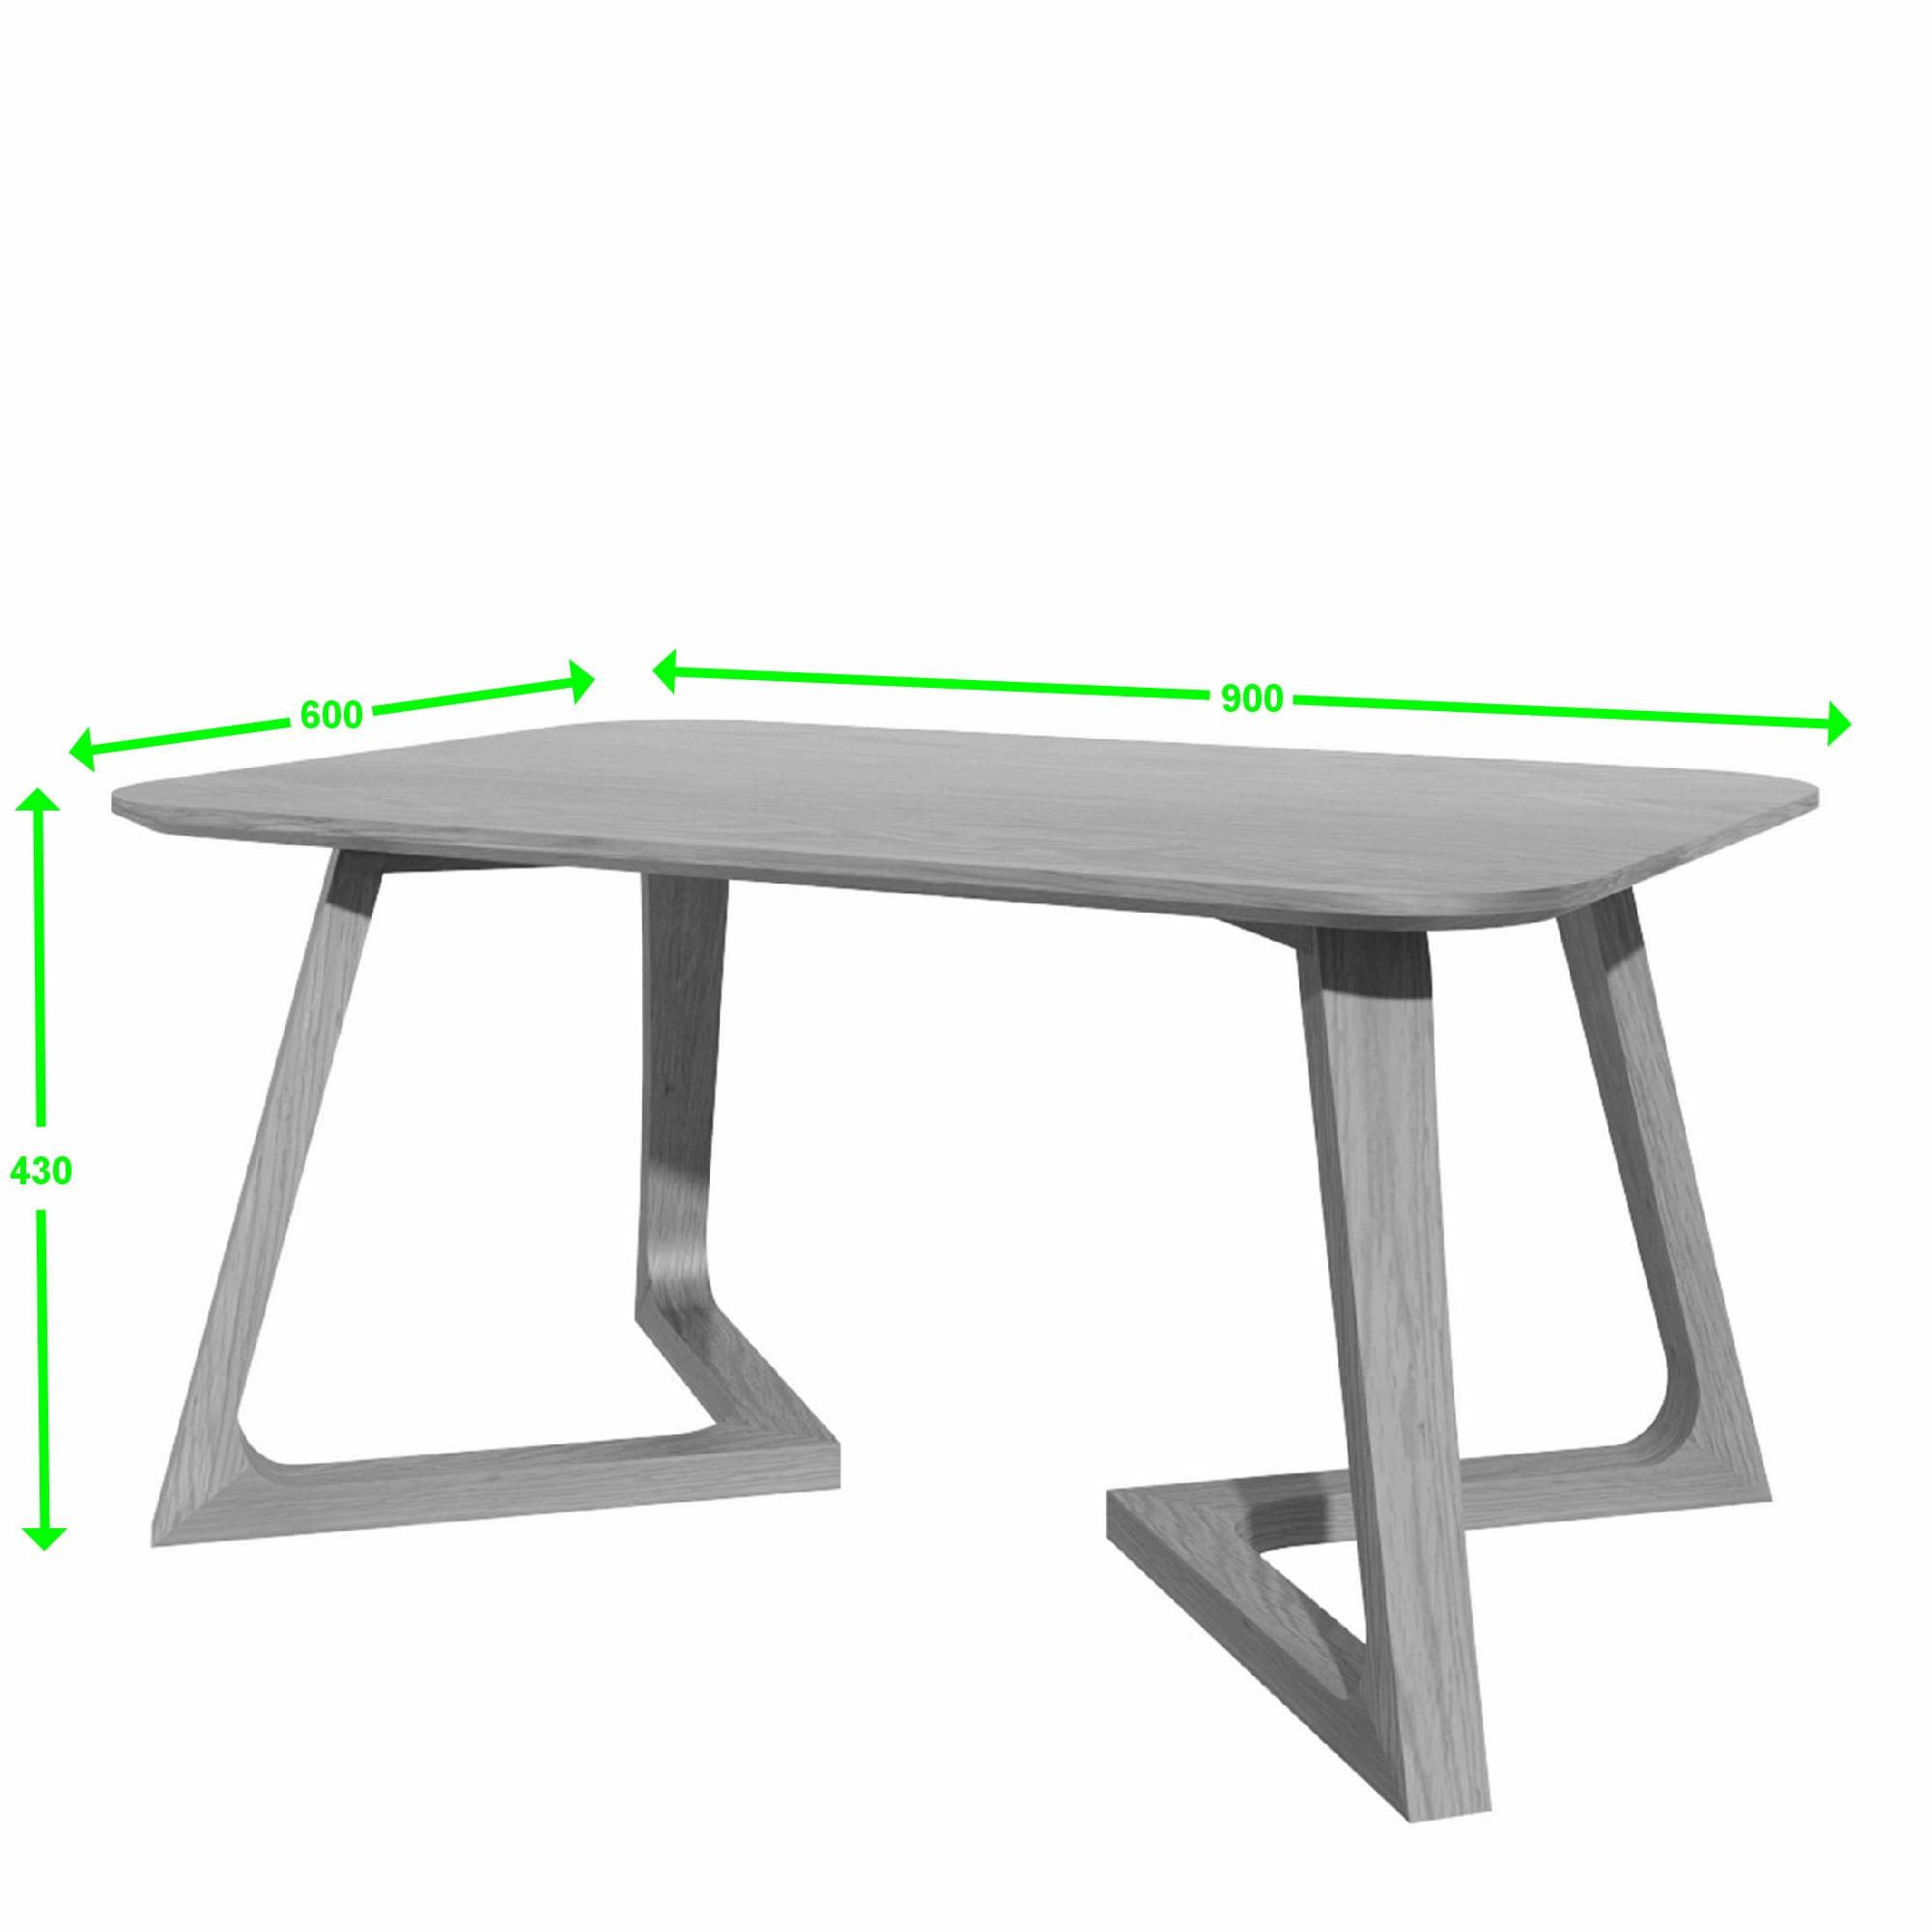 SCAVMLT scandic medium lamp table measures